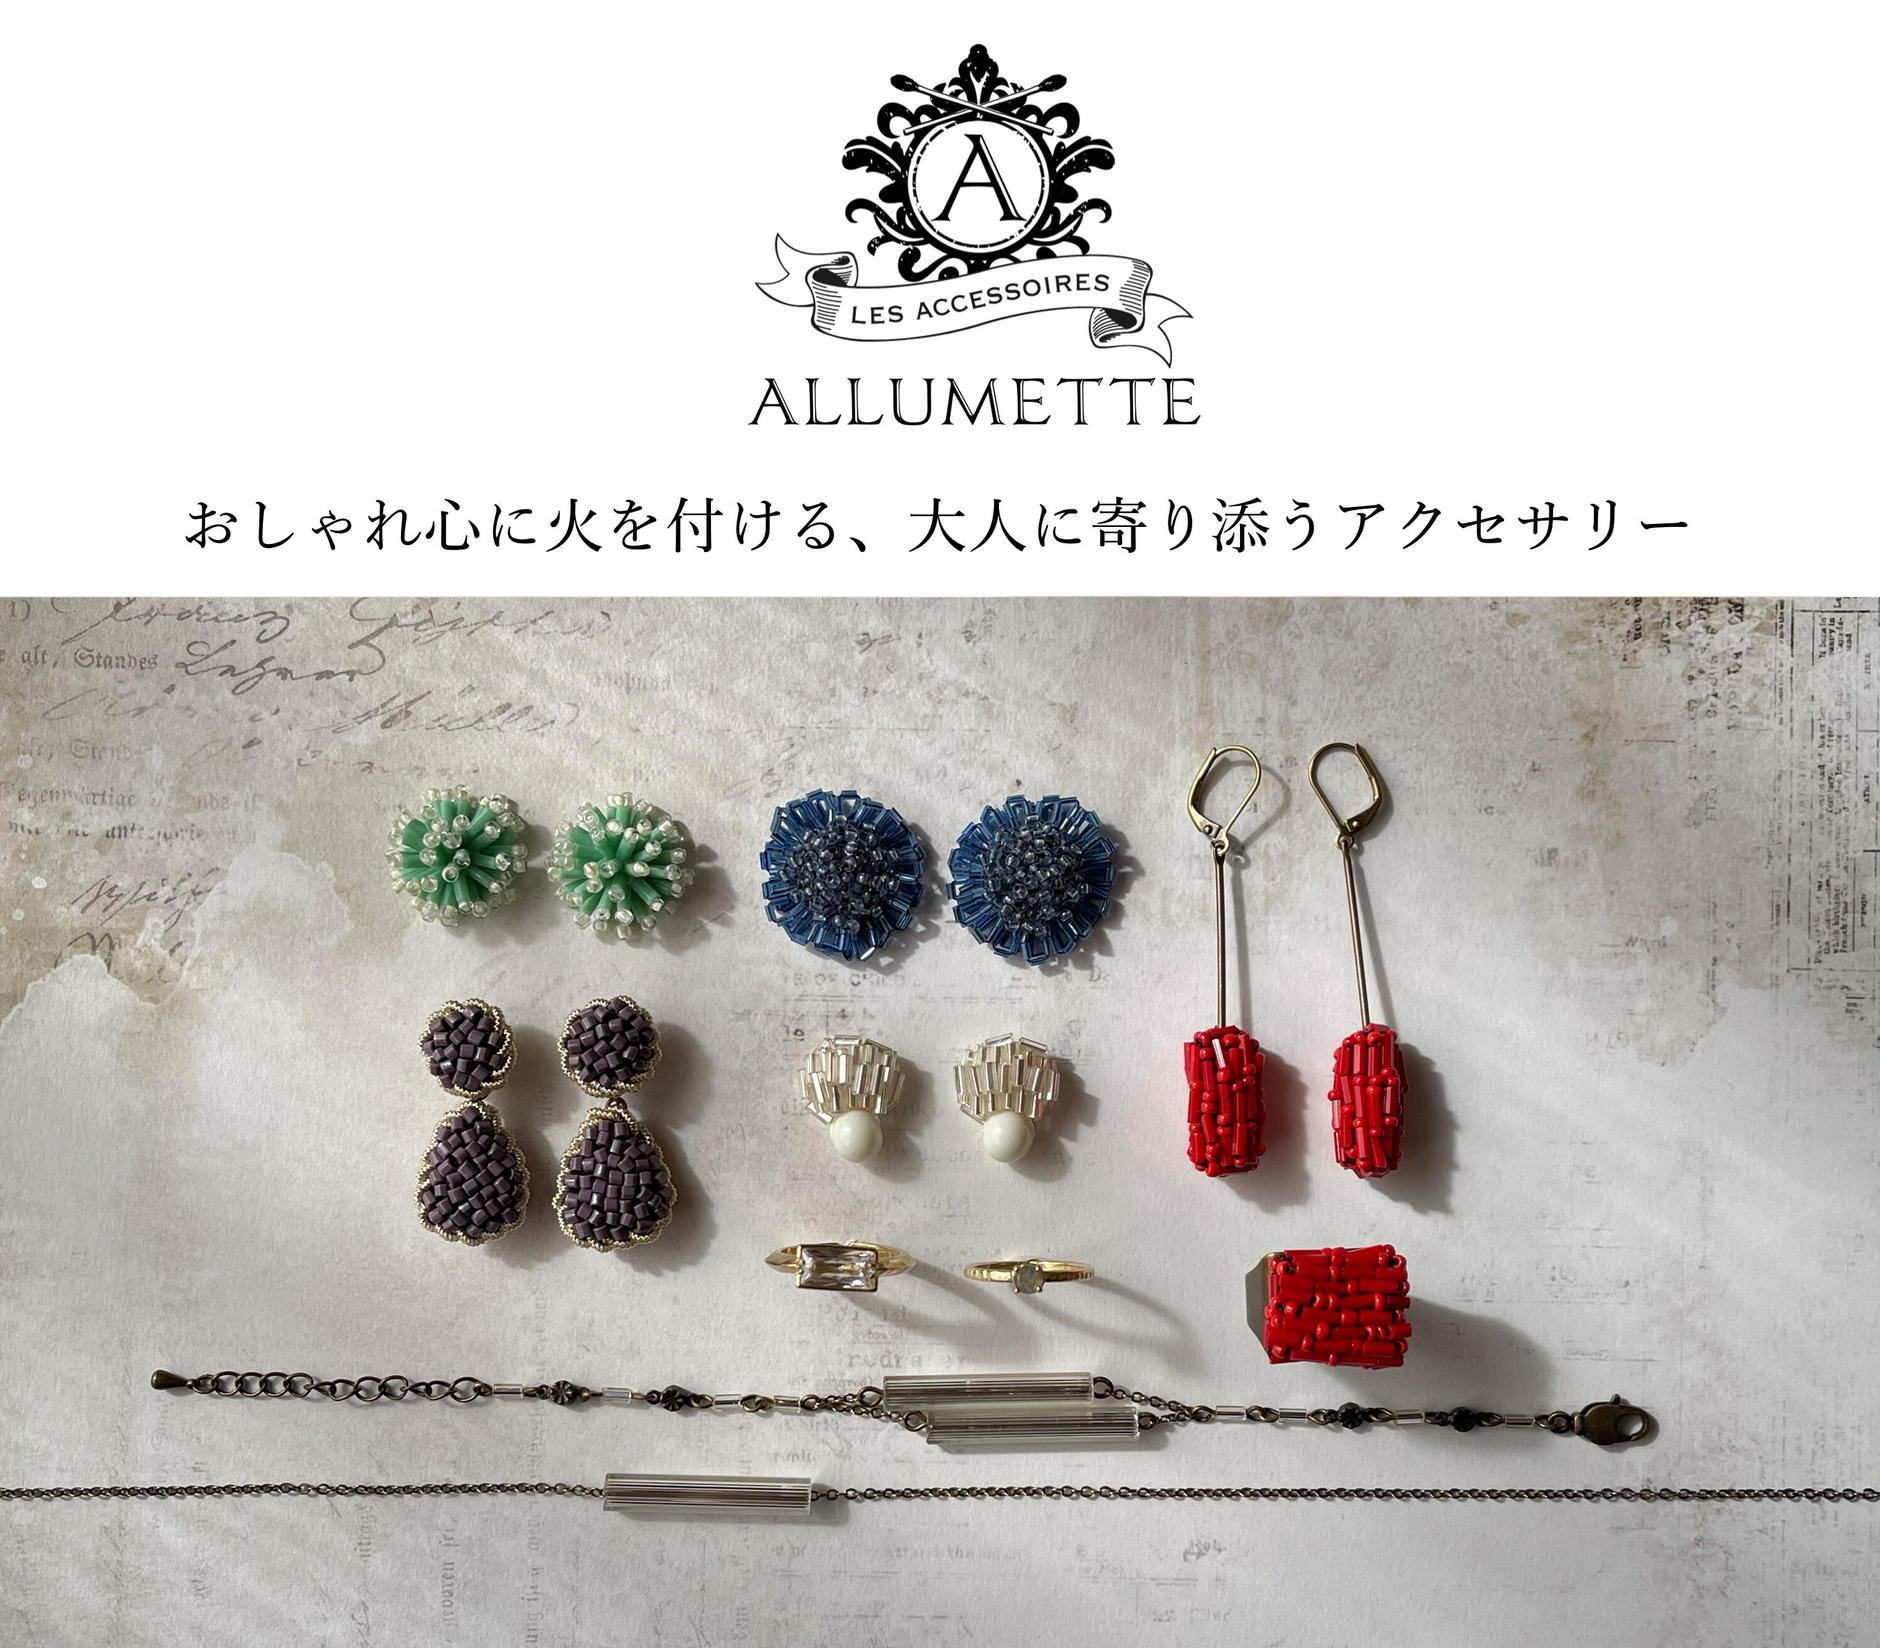 ALLUMETTE online shop | おしゃれ心に火をつける、大人に寄り添うアクセサリー